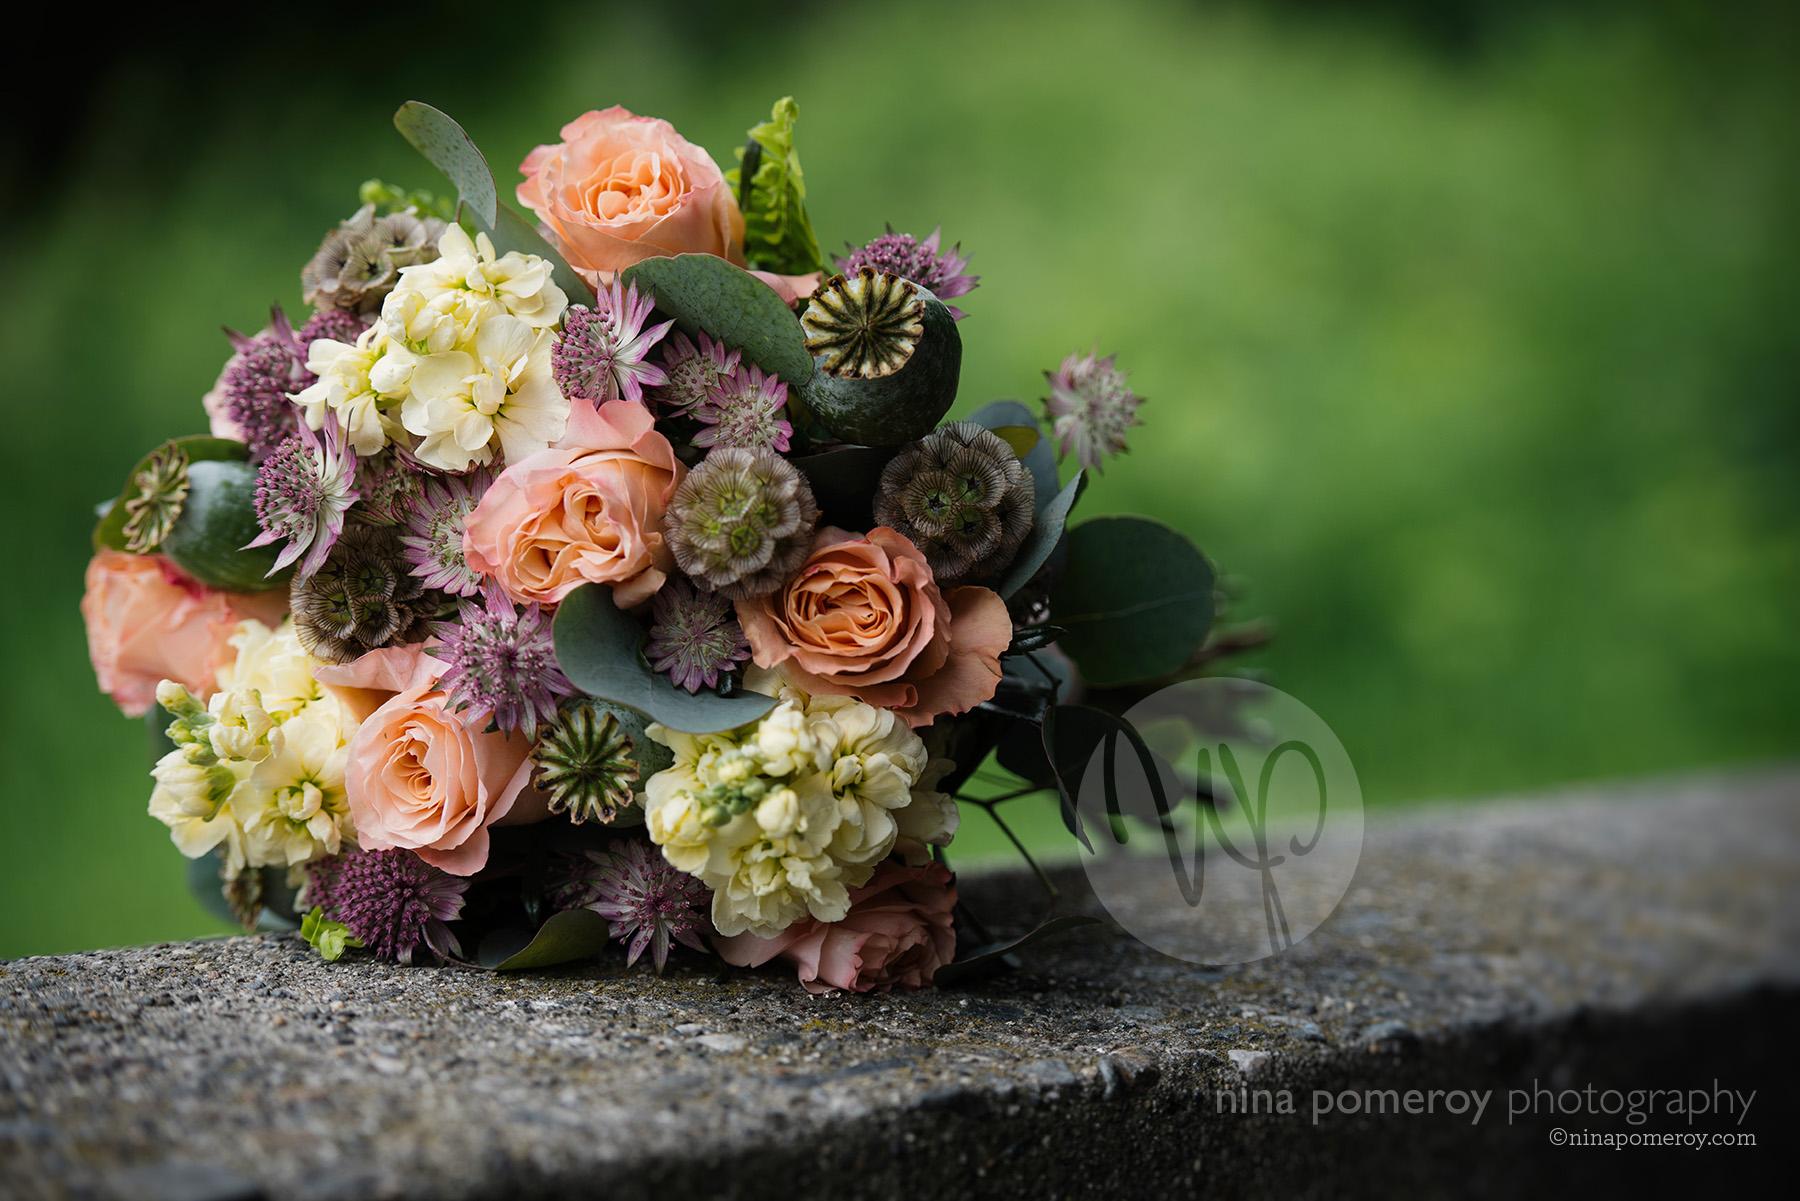 napa vineyard wedding photographer bouquet flowers ninapomeroy.com